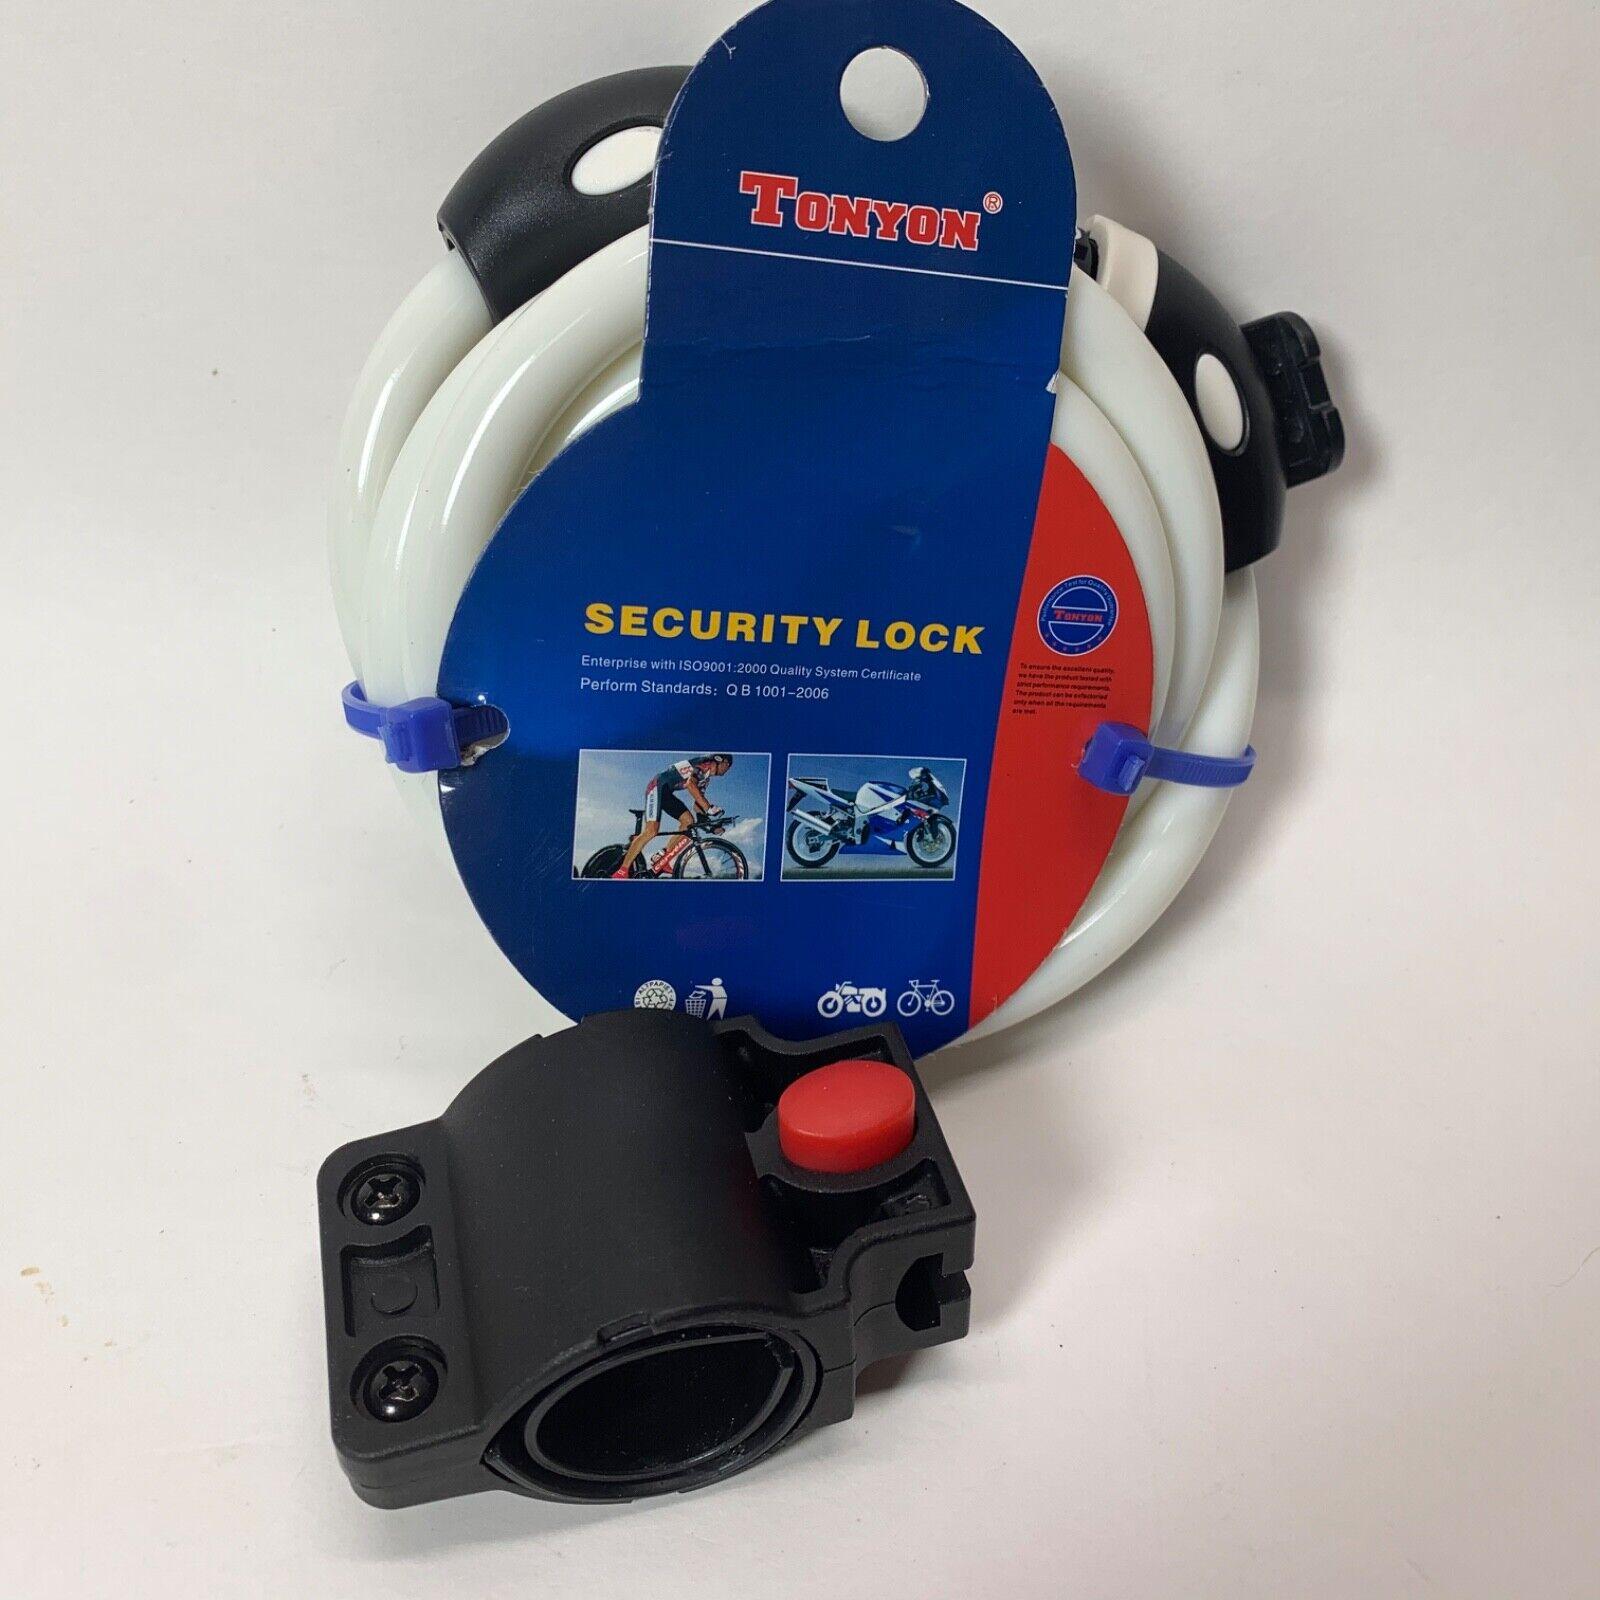 TONYON Bike Cable Lock 5-Digit Combination Password Anti-The